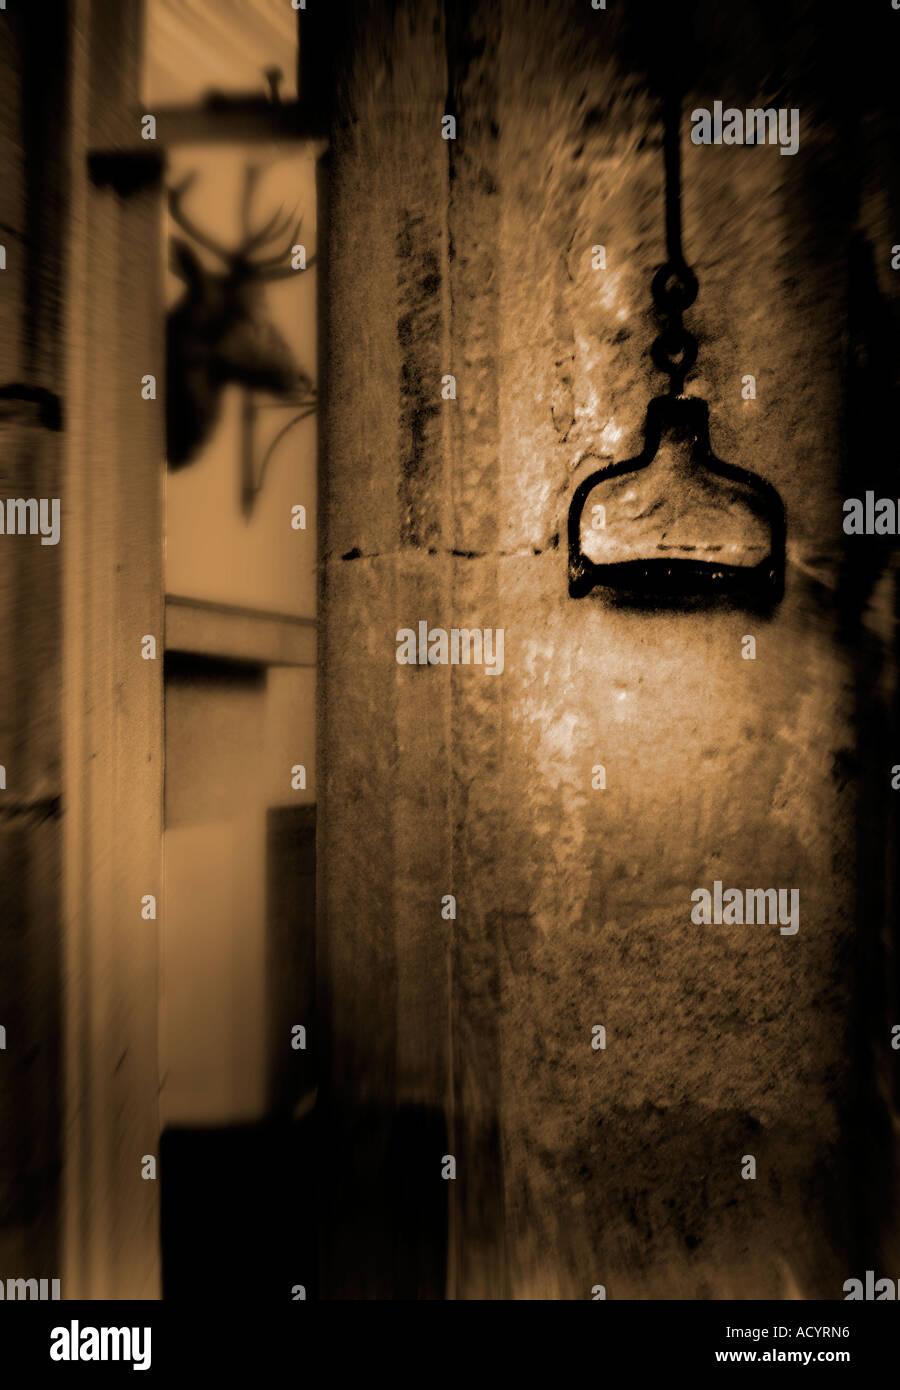 old antique doorbell pull - Old Antique Doorbell Pull Stock Photo: 7575701 - Alamy